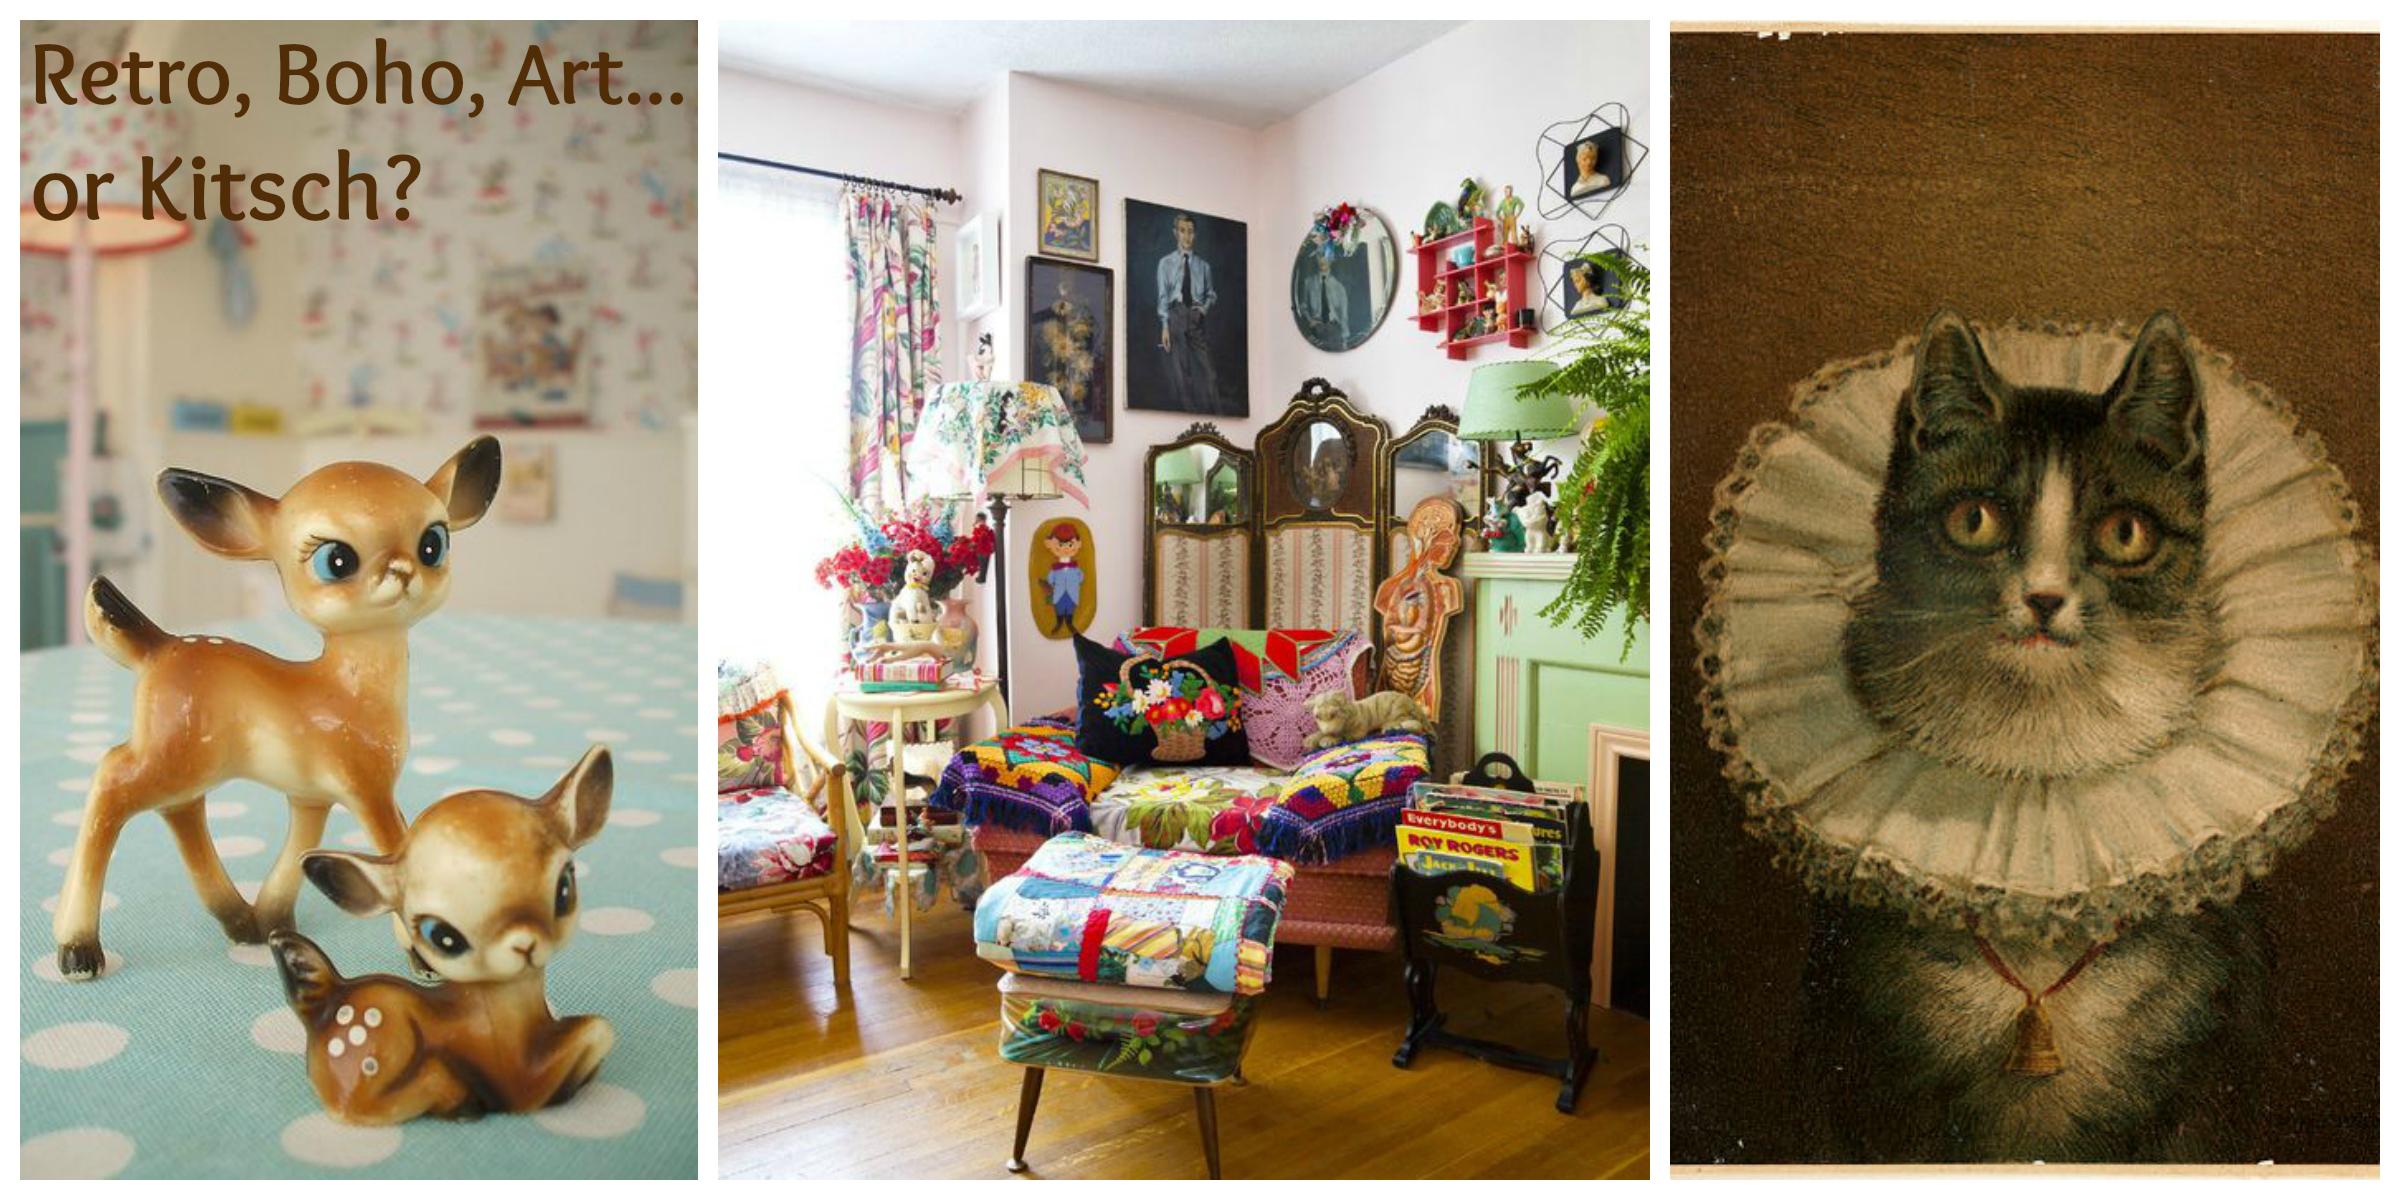 Boho, Retro, Art or Kitsch. Porcelain deer. Boho Lounge. Cat painting